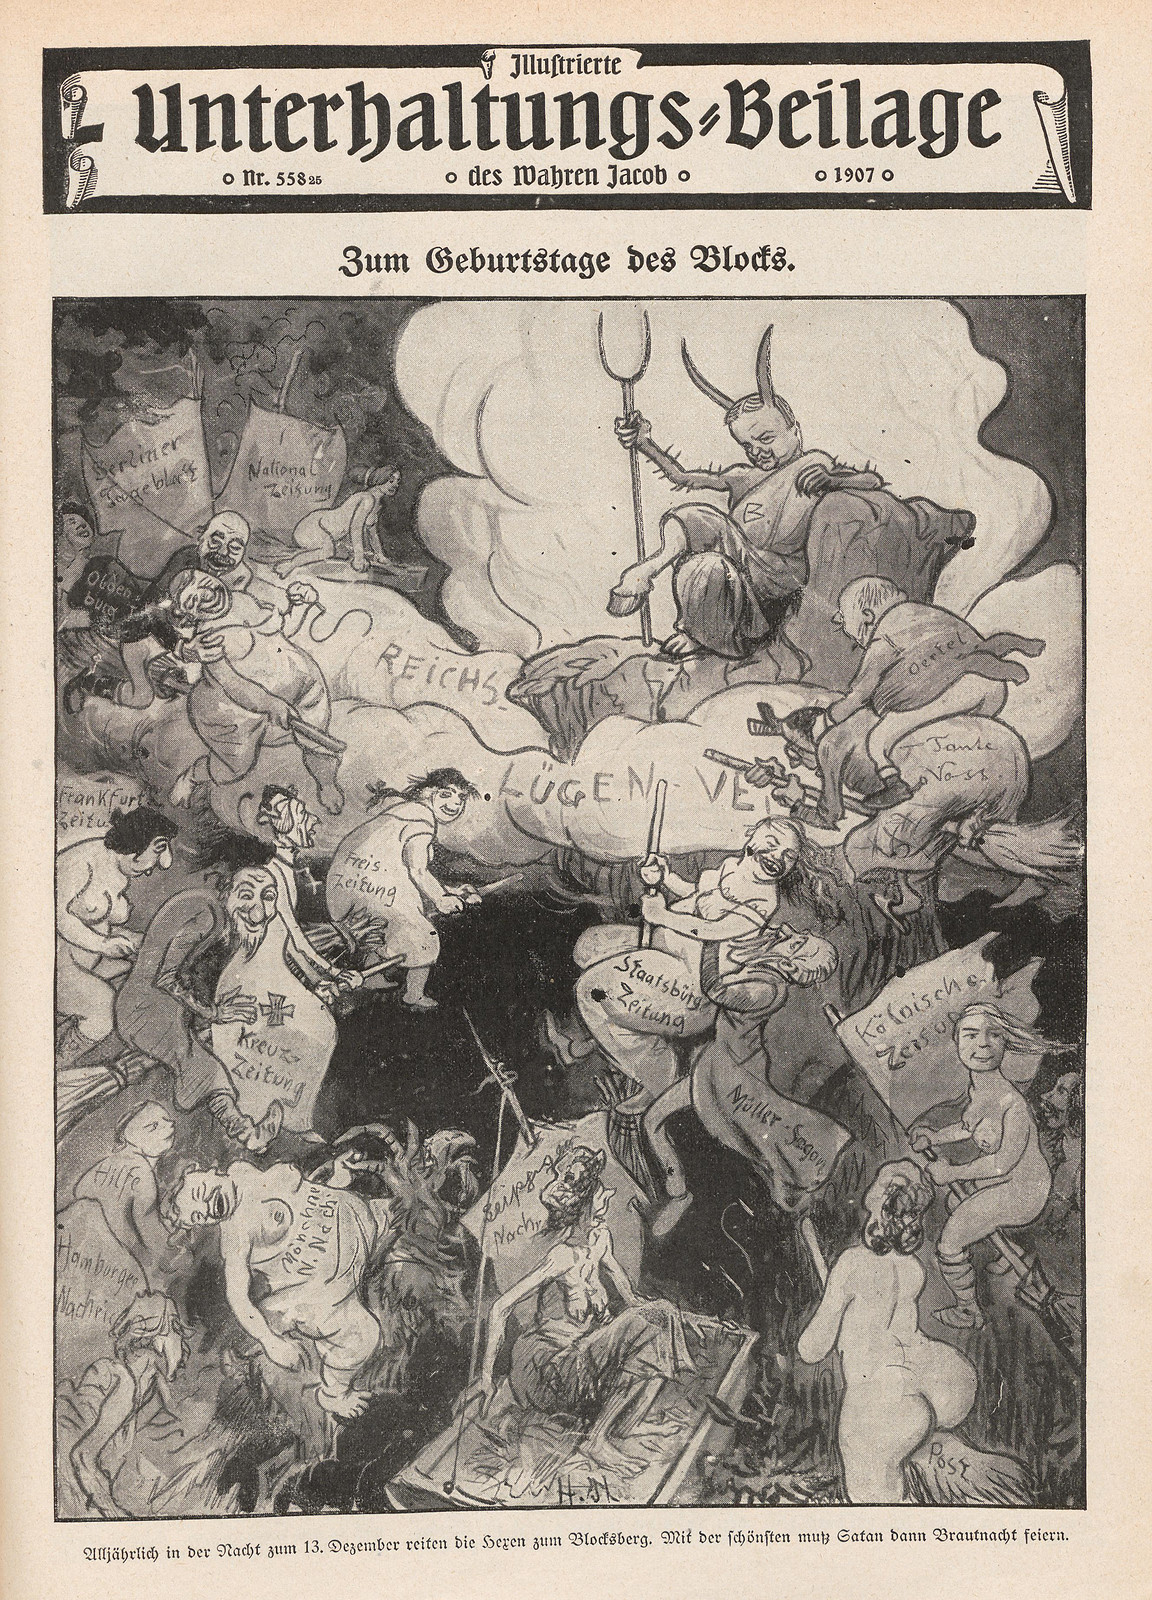 Hans Gabriel Jentzsch - On the birthday of the block, 1907